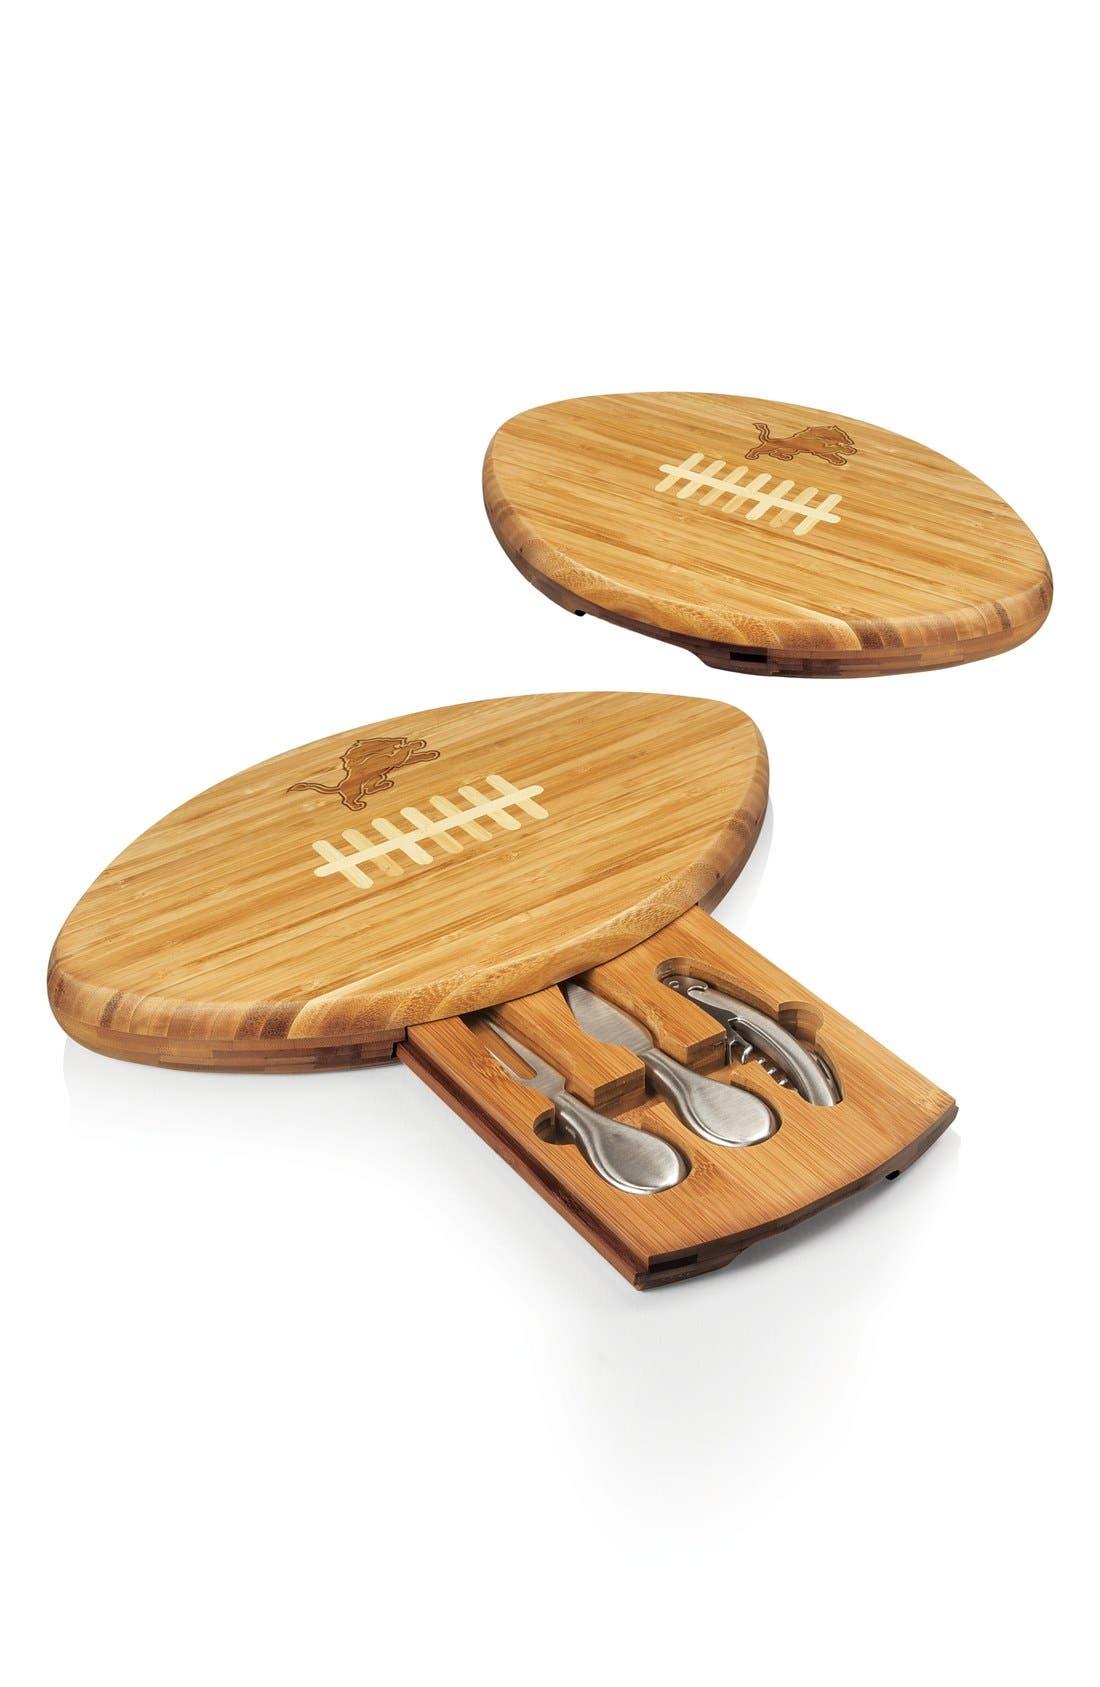 Alternate Image 2  - Picnic Time 'Quarterback' NFL Engraved Cutting Board & Knives